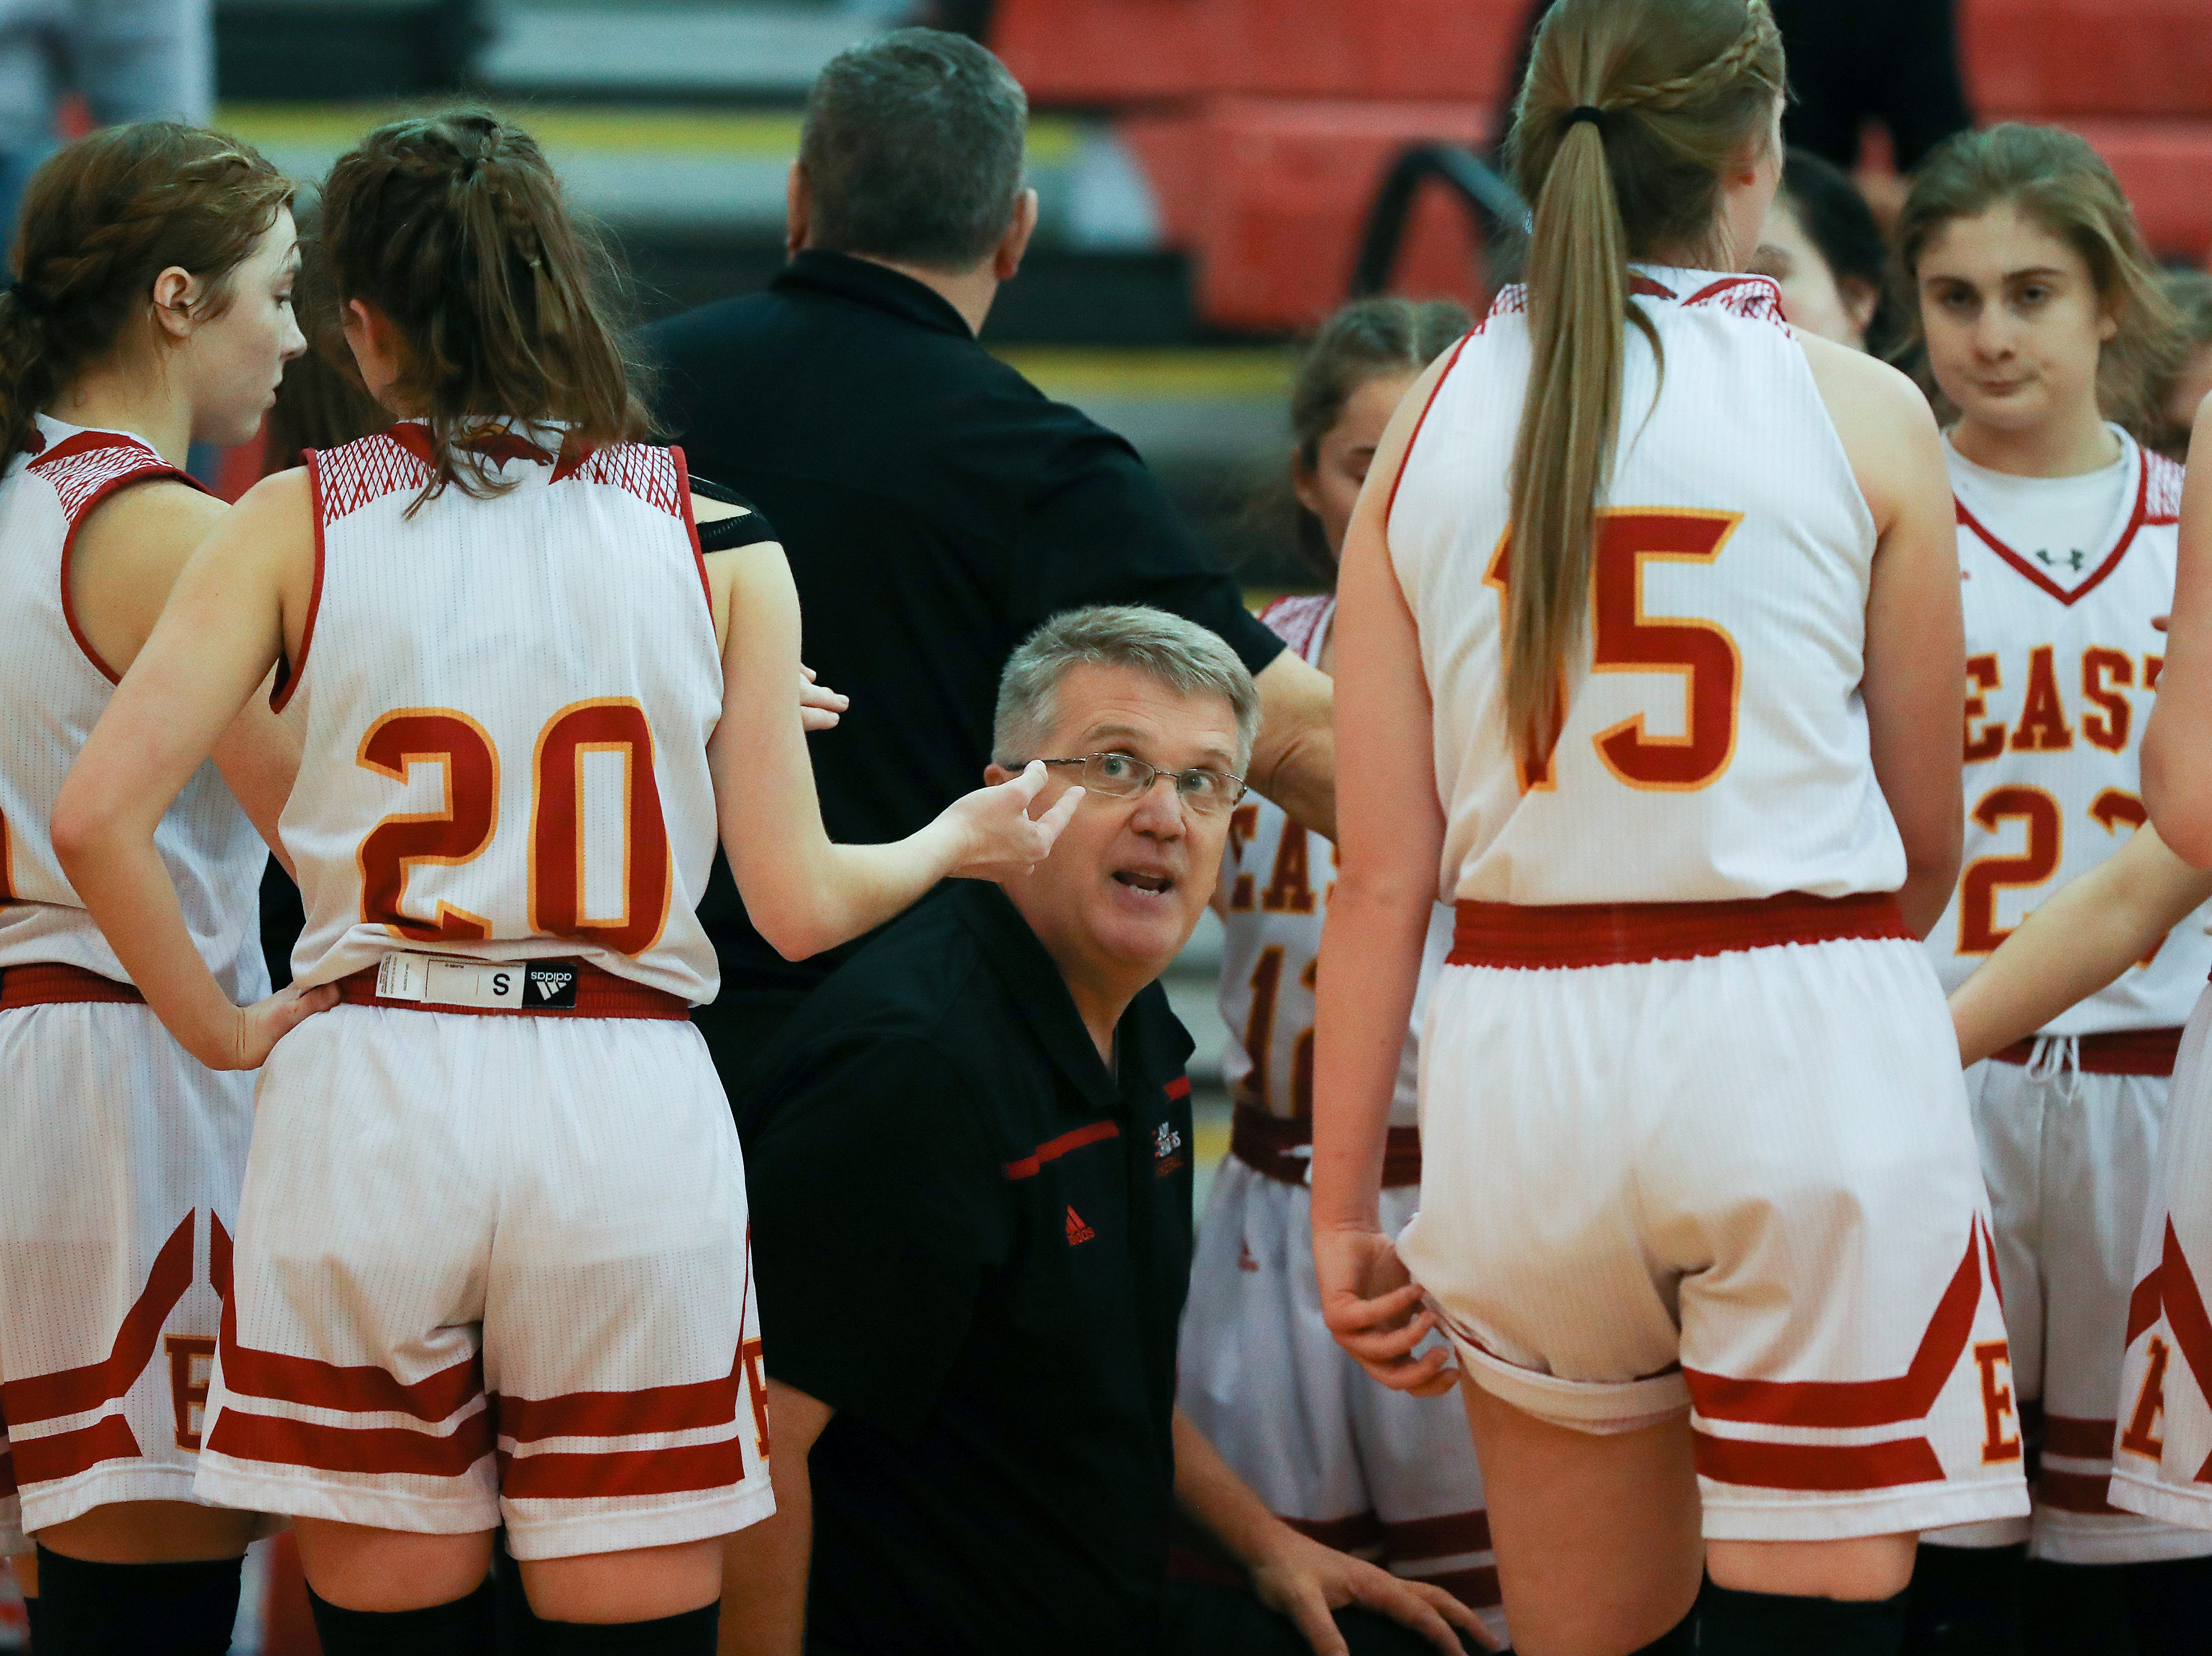 Bullitt East head coach Chris Stallings instructed his team against Mercy at the Bullitt East High School.Jan. 9, 2019